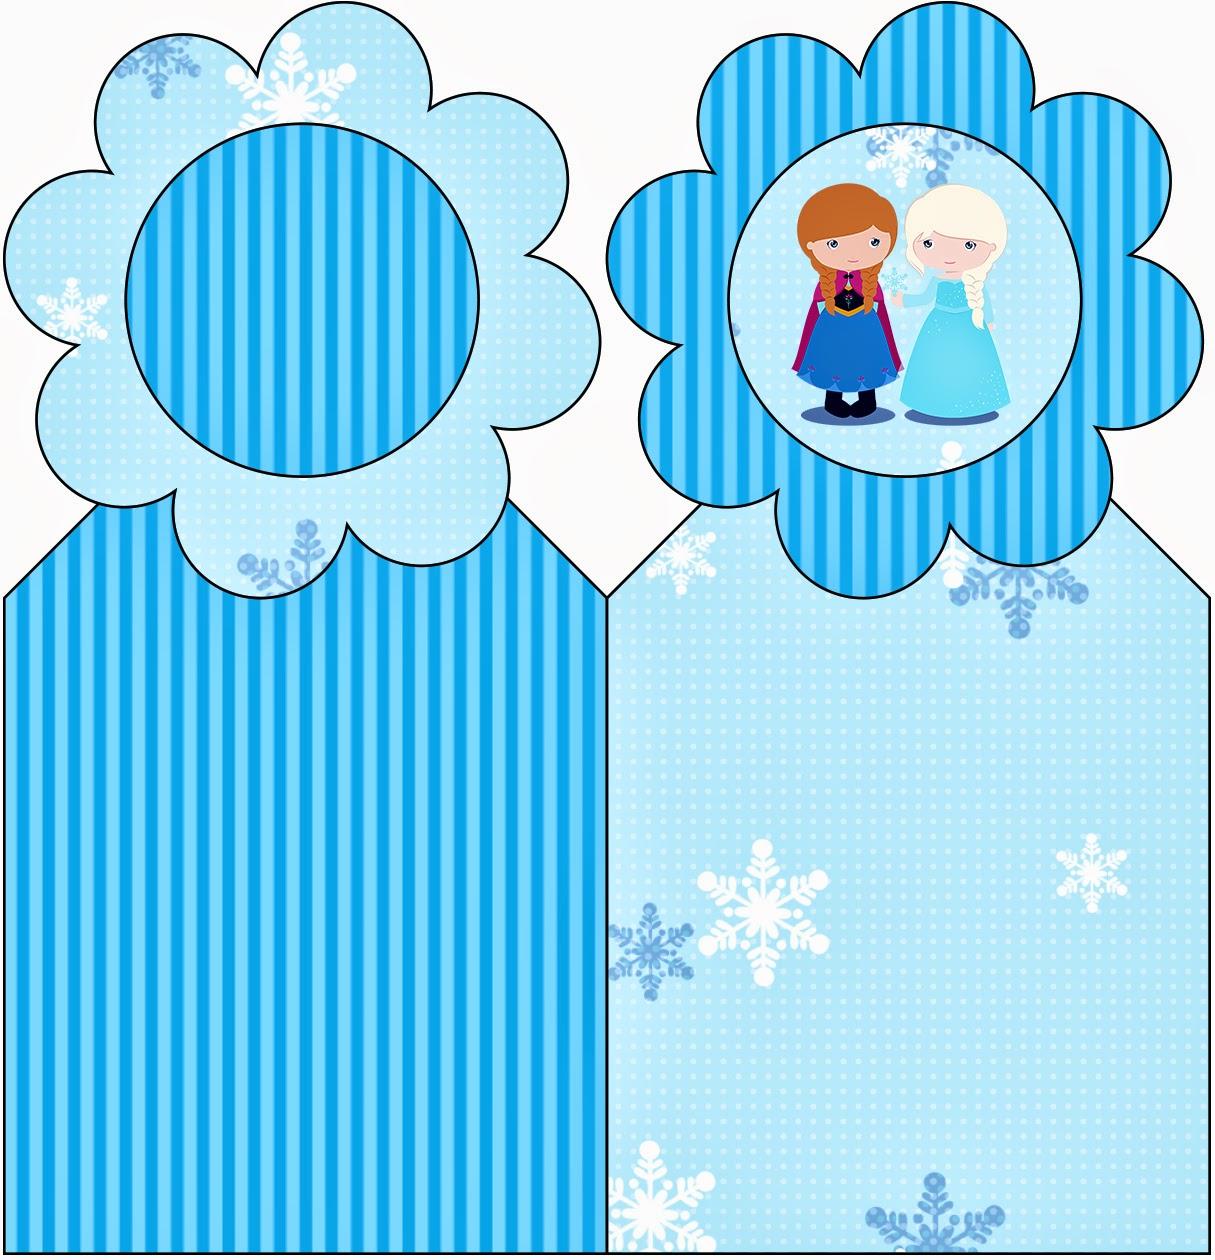 Frozen Niñas para Navidad Azul: Imprimibles Gratis para Fiestas ...